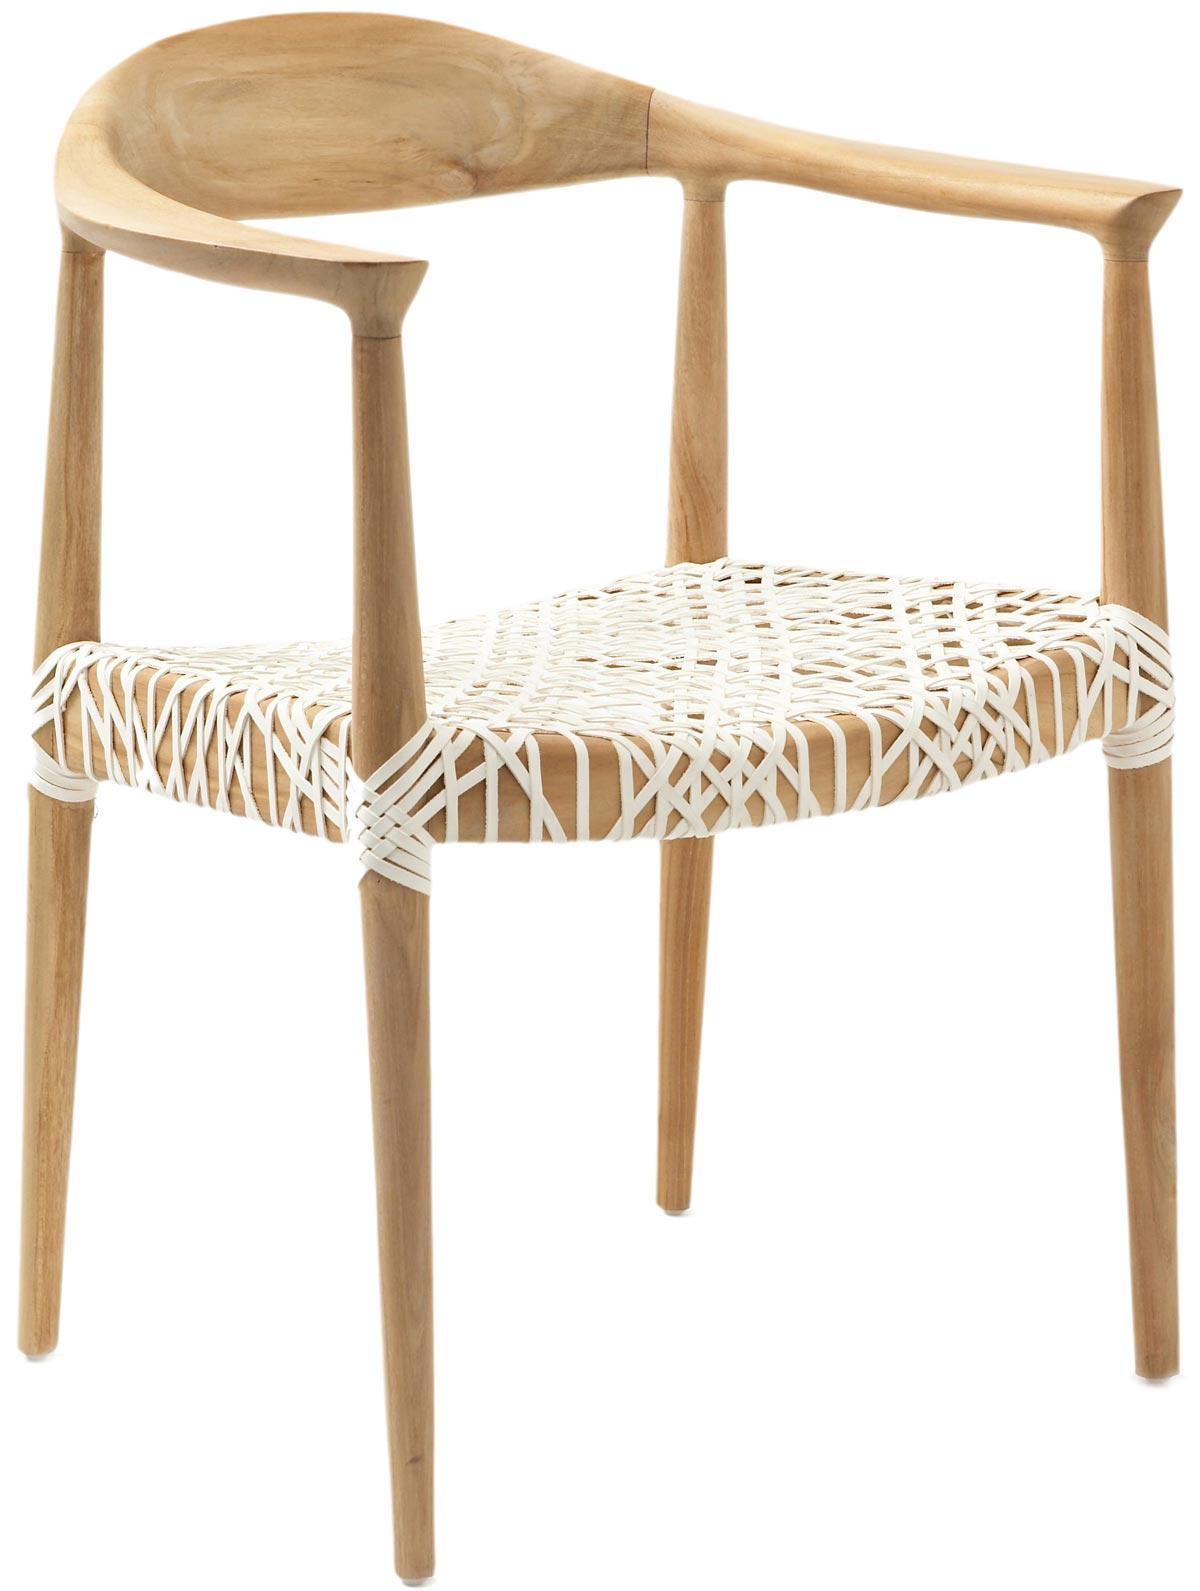 Safavieh Fox1003a Bandelier Arm Chair 711 00 Accent